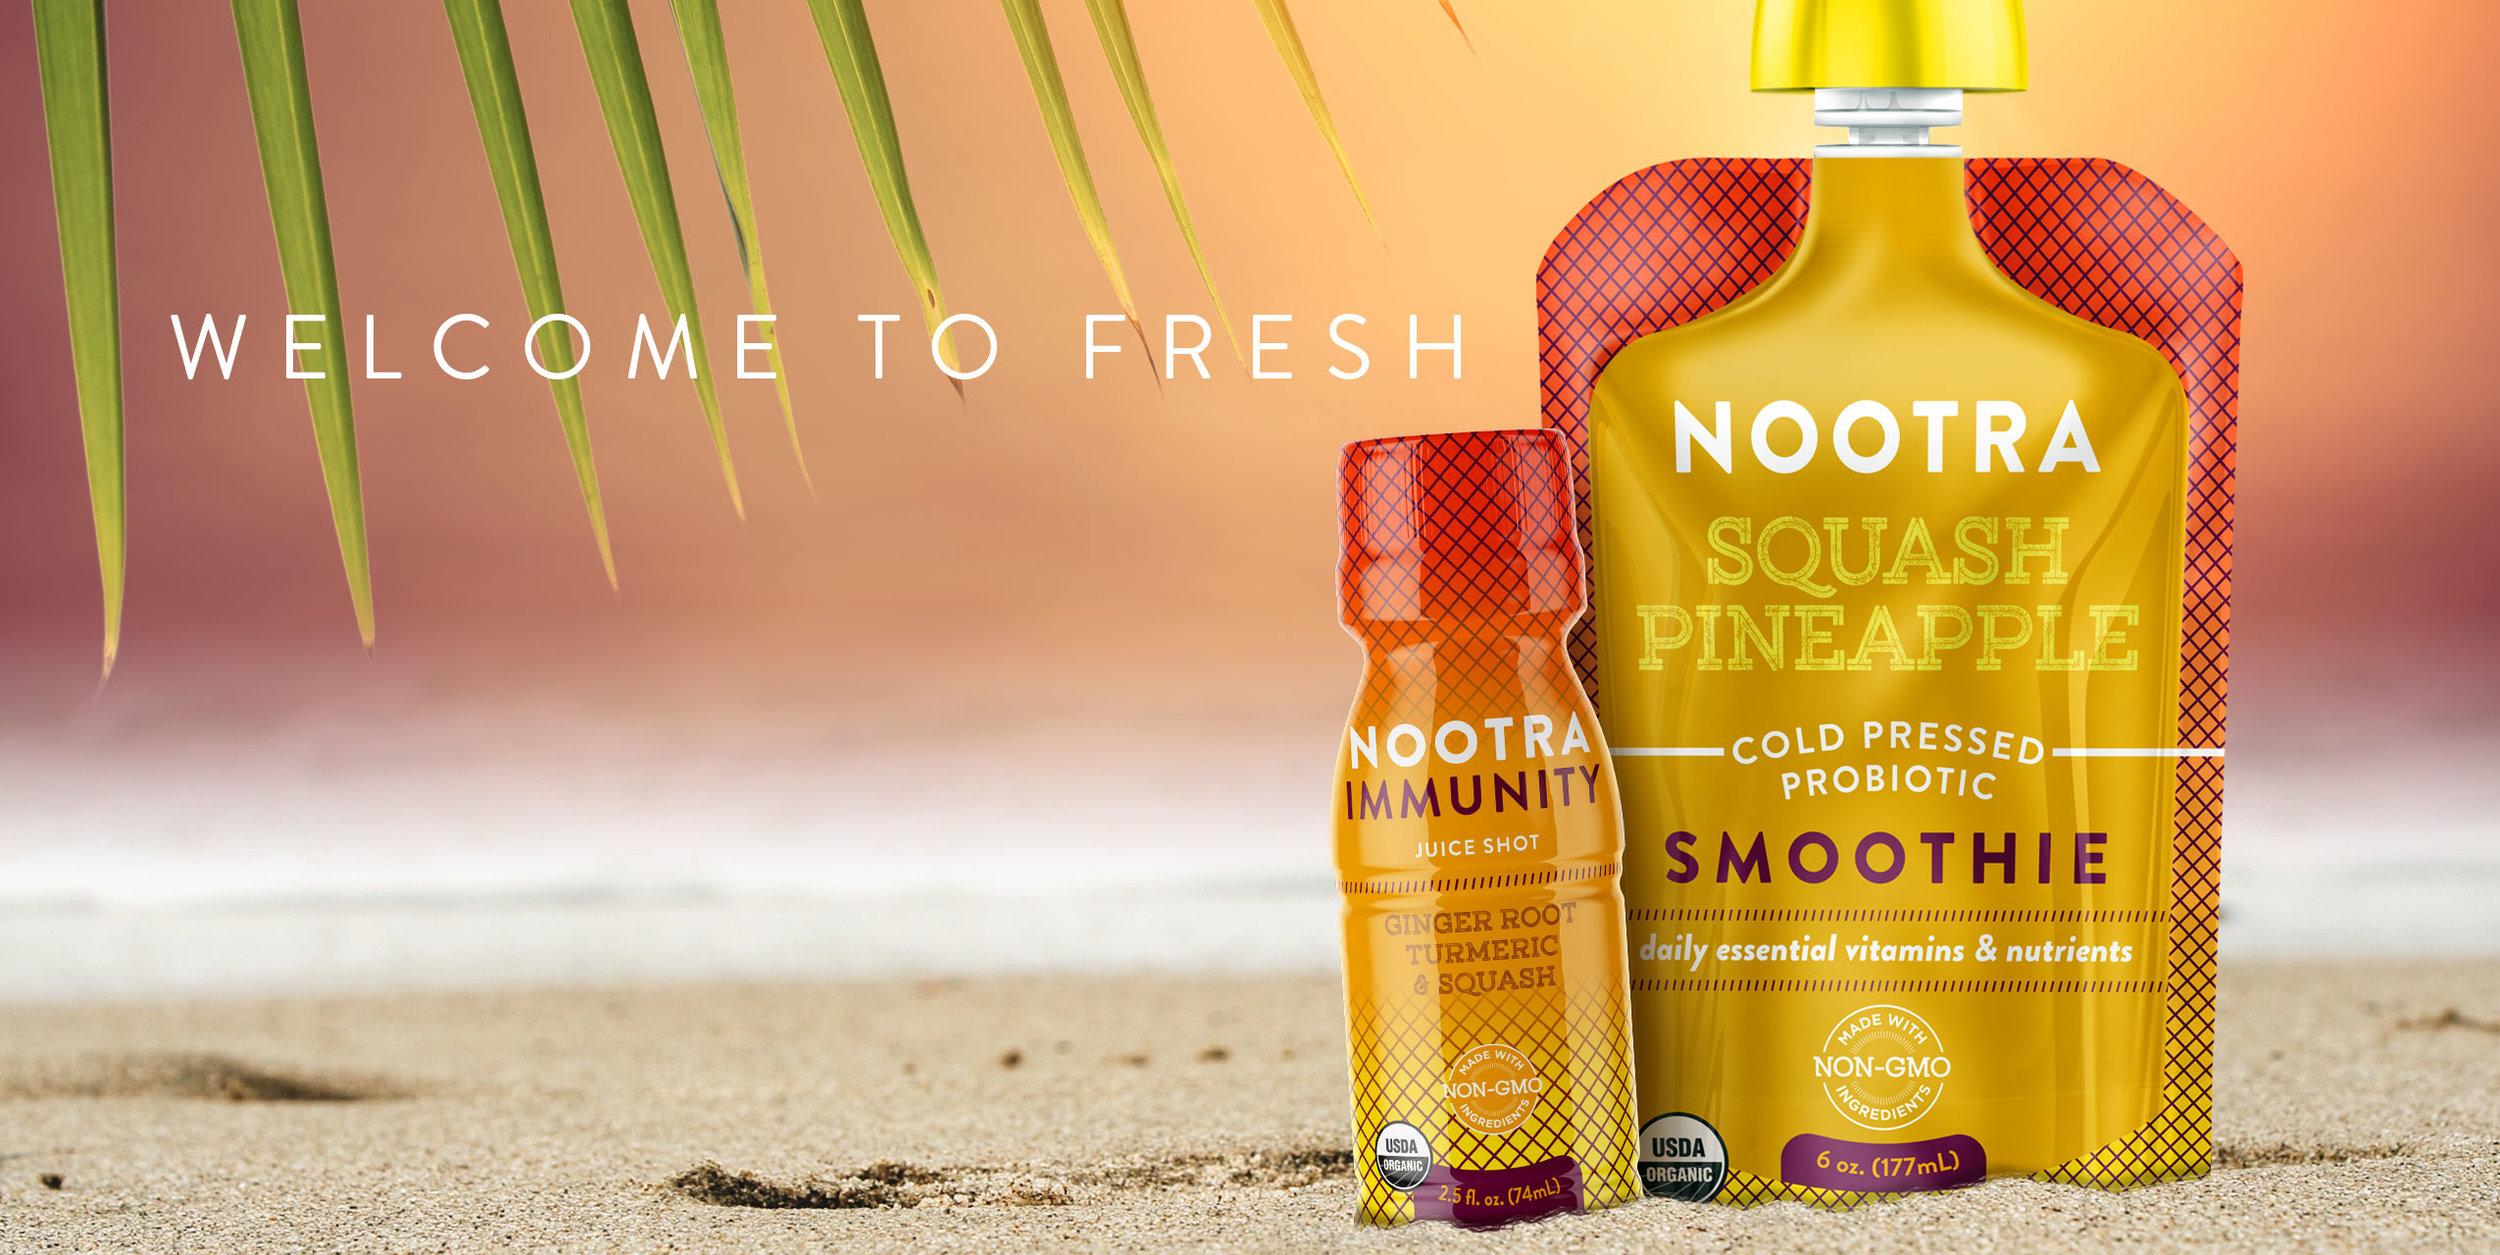 NOOTRA-WEB-LP-Squash-Pineapple_Shot.jpg